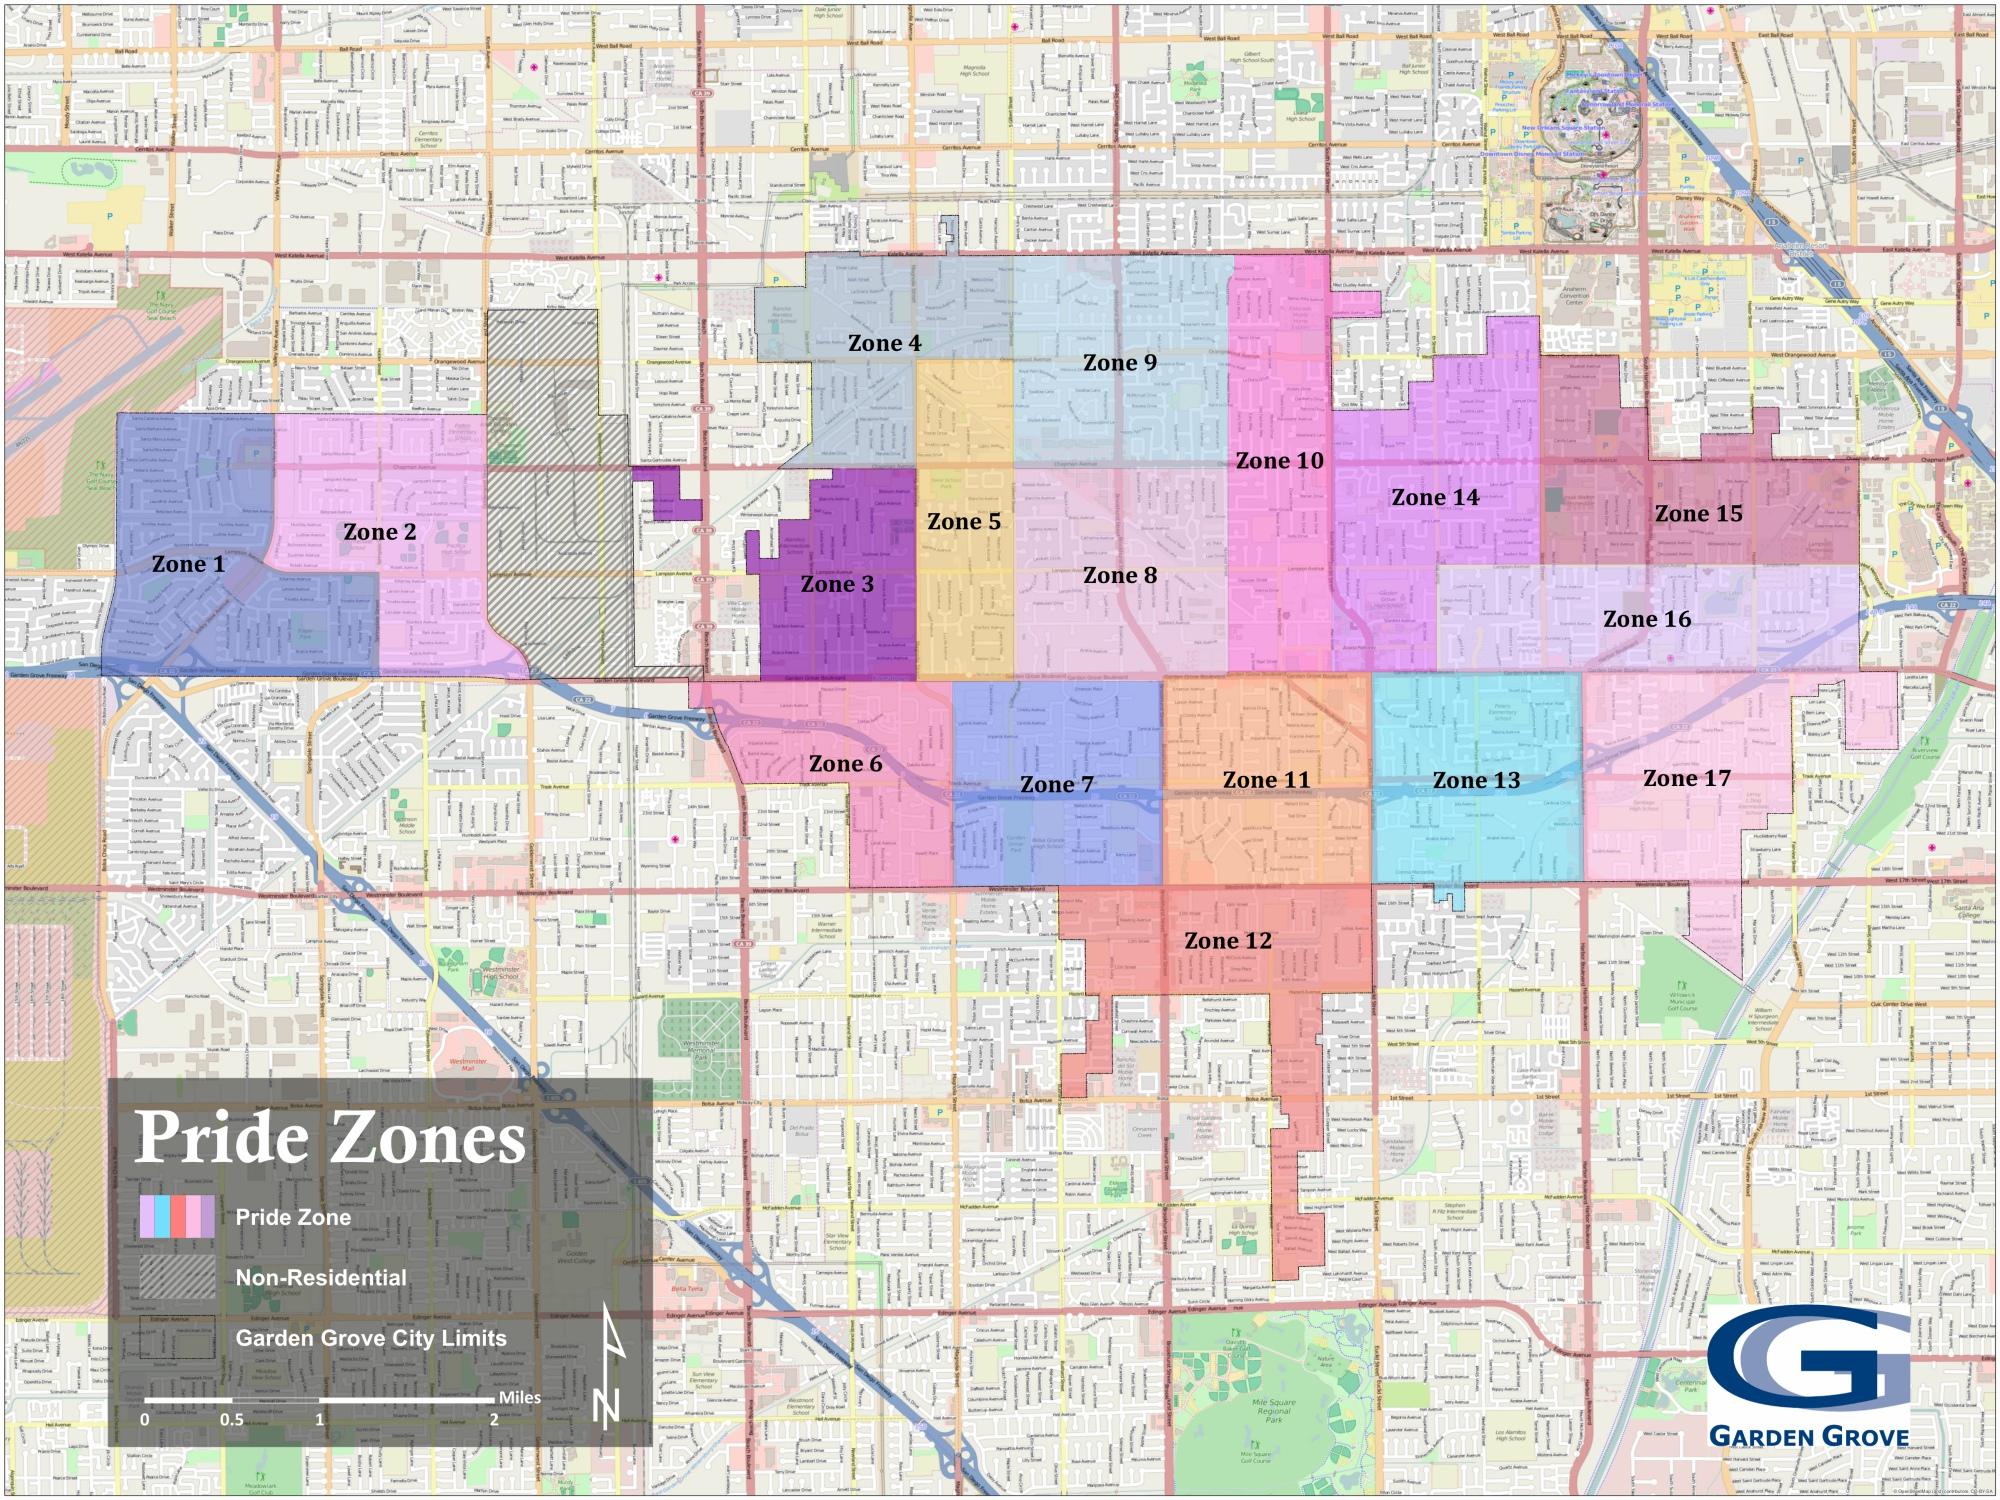 Map Of Garden Grove California - Klipy - Where Is Garden Grove California On The Map